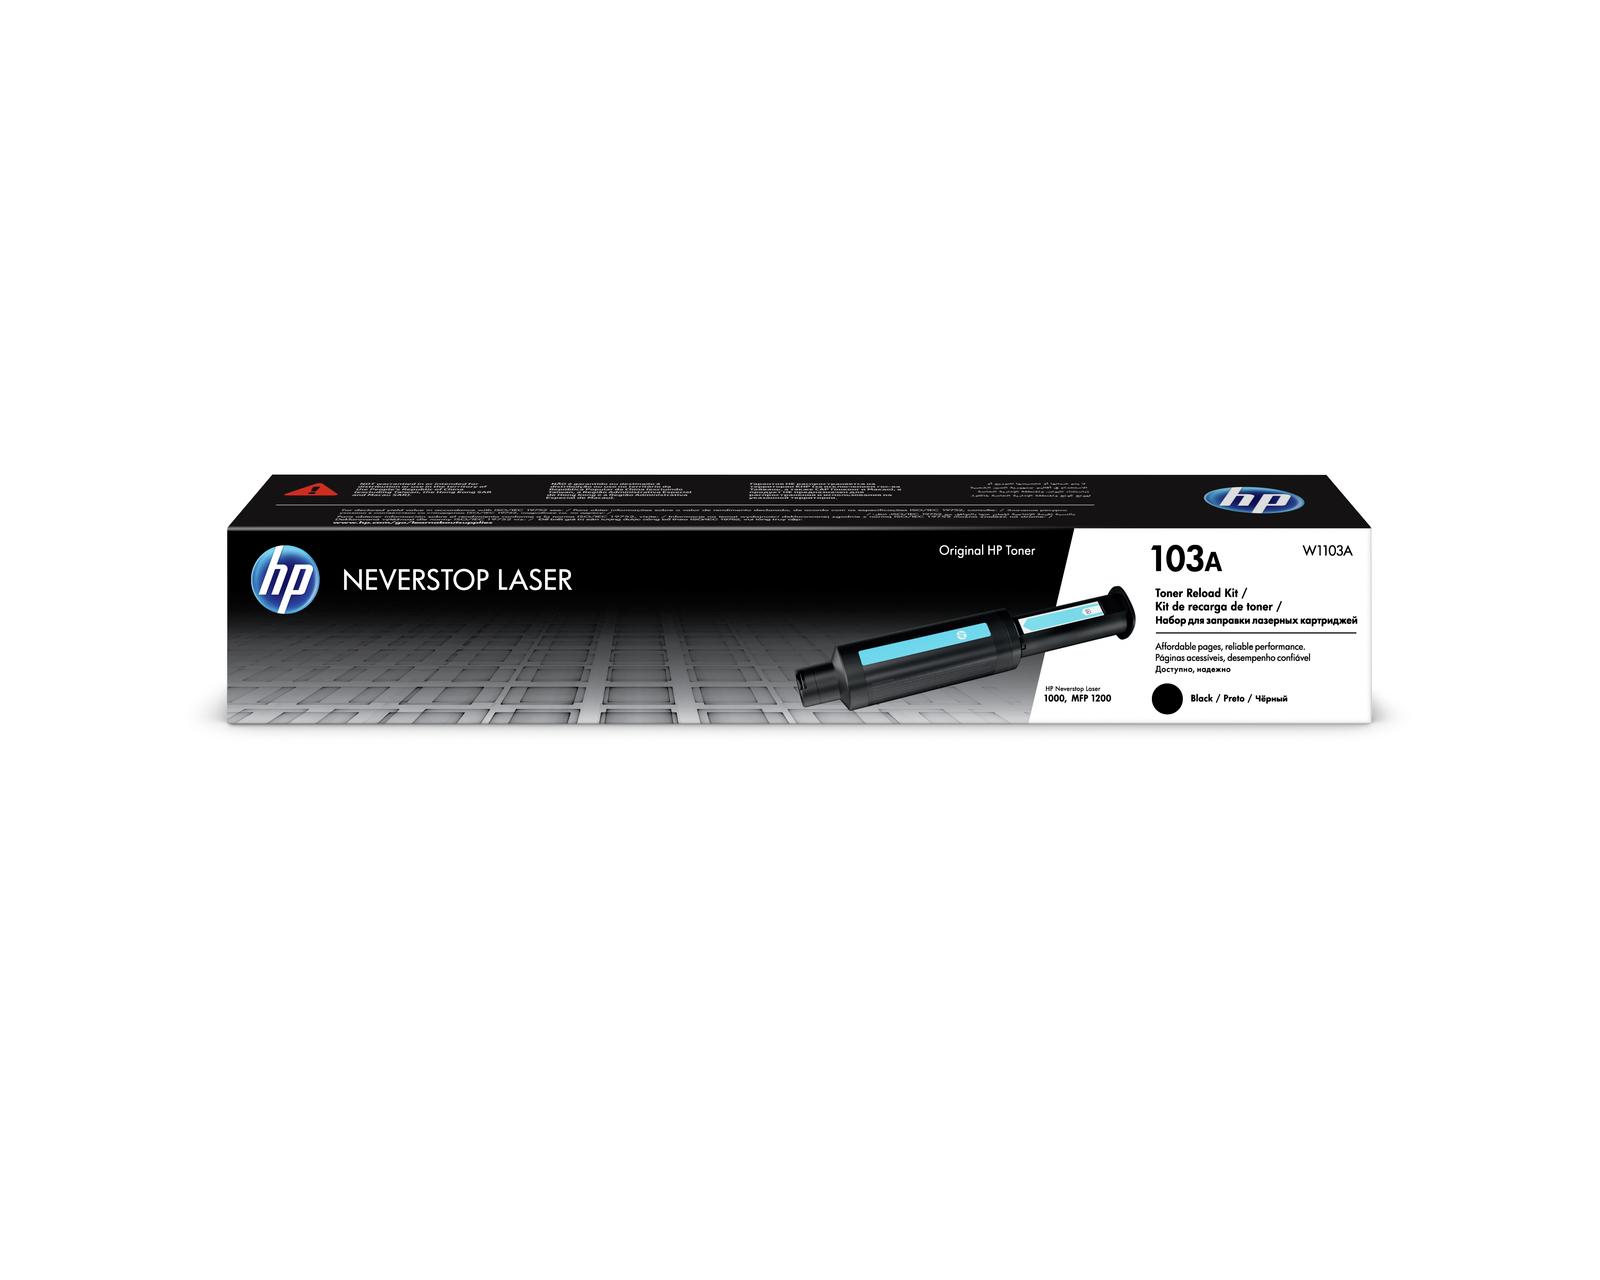 HP #103A BLACK ORIGINAL LASER RECHARGE KIT FOR HP NEVERSTOP